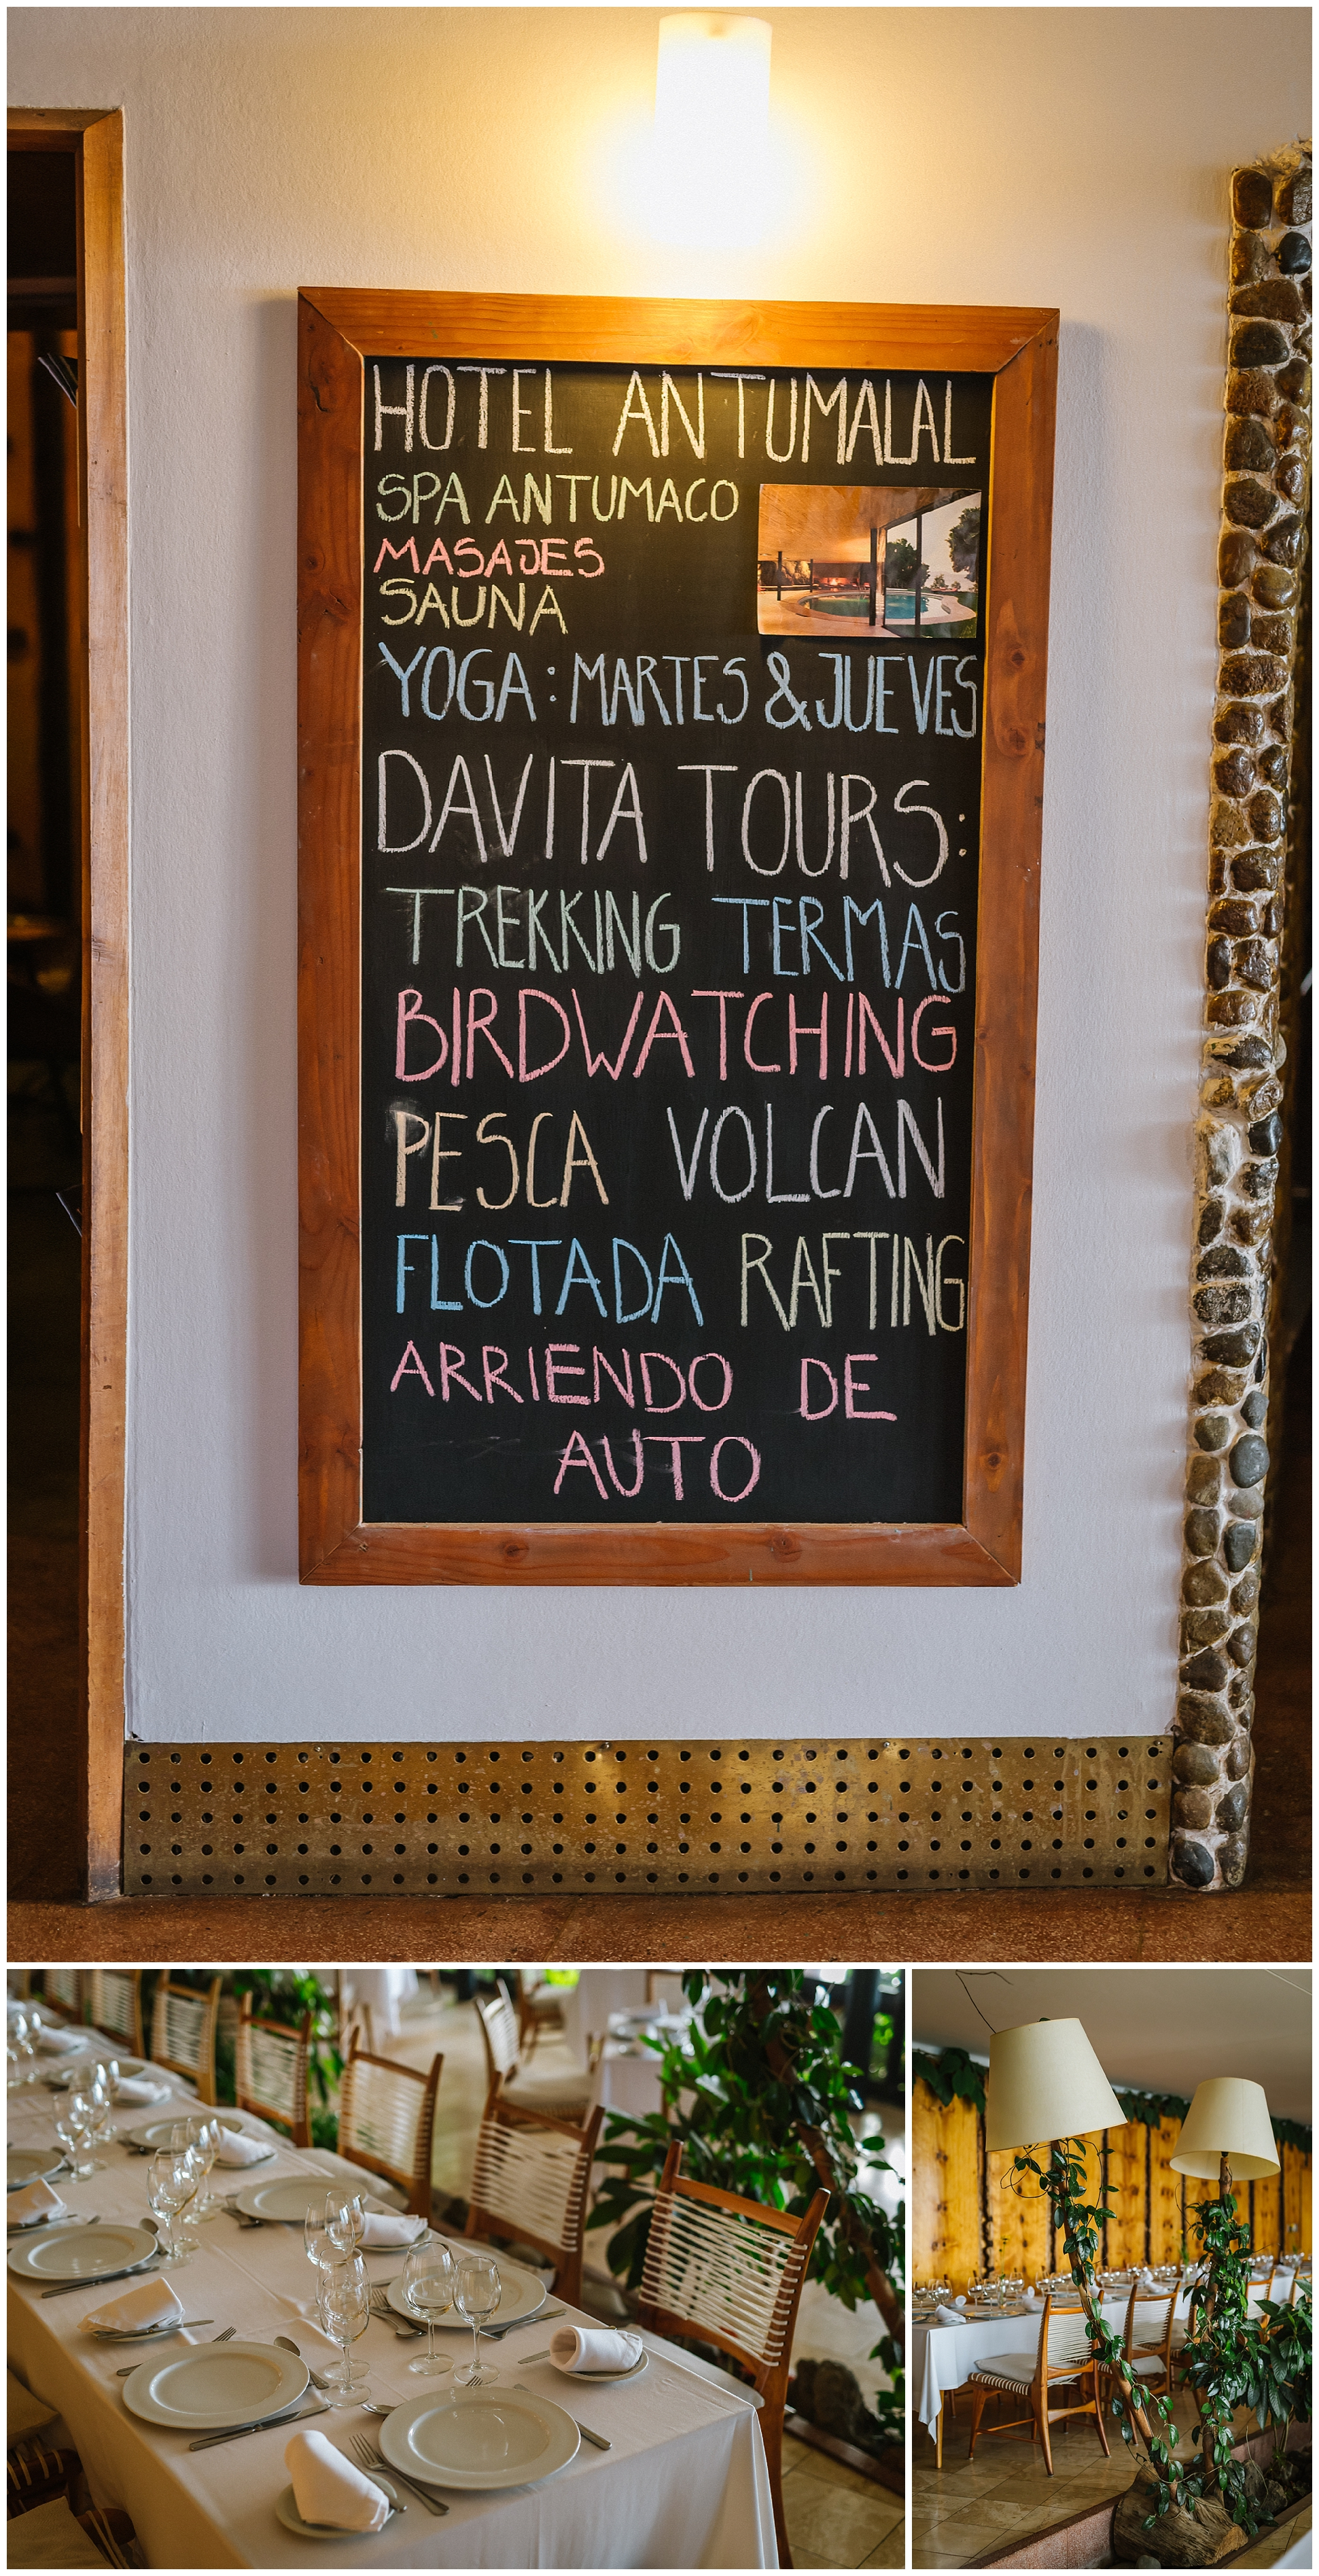 Cheilean-destination-adventure-wedding-florida-patagonia-pucon-santa-cruz-vsco_0013.jpg